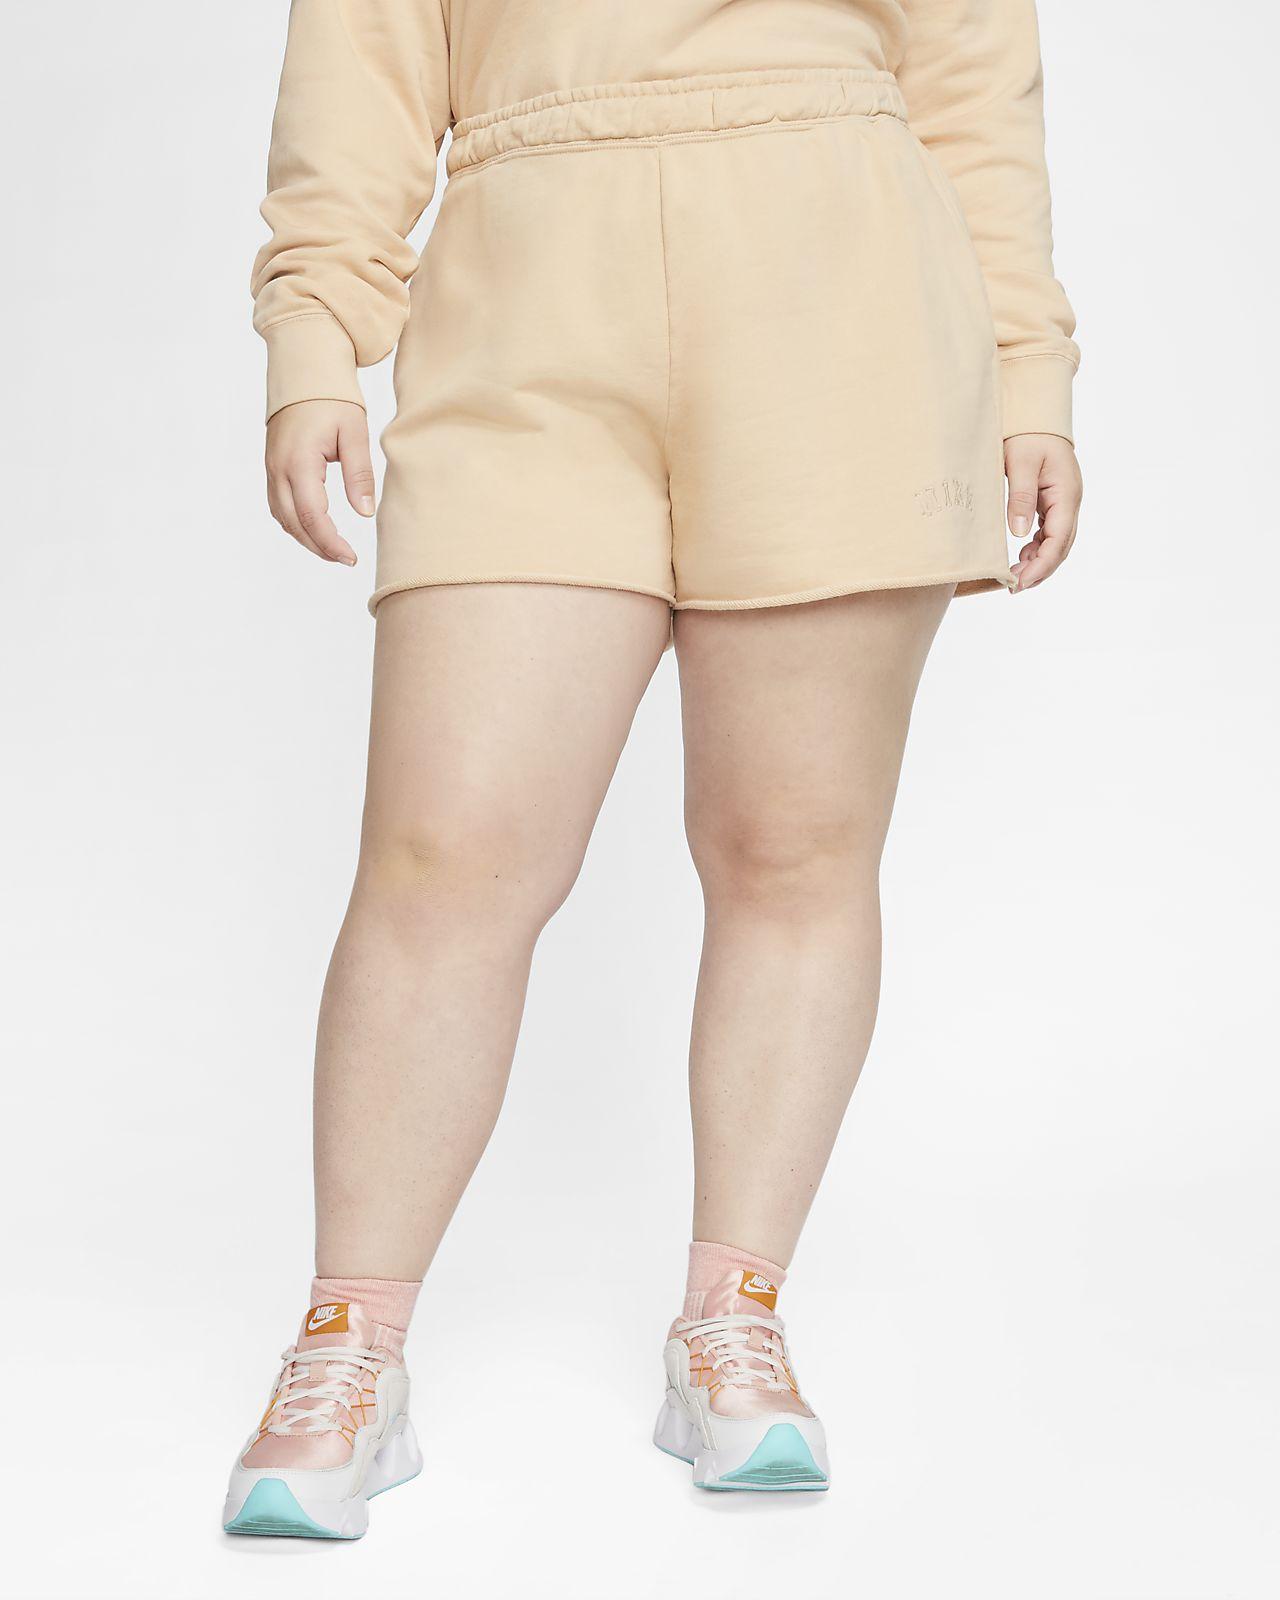 Nike Sportswear Women's French Terry Shorts (Plus Size)